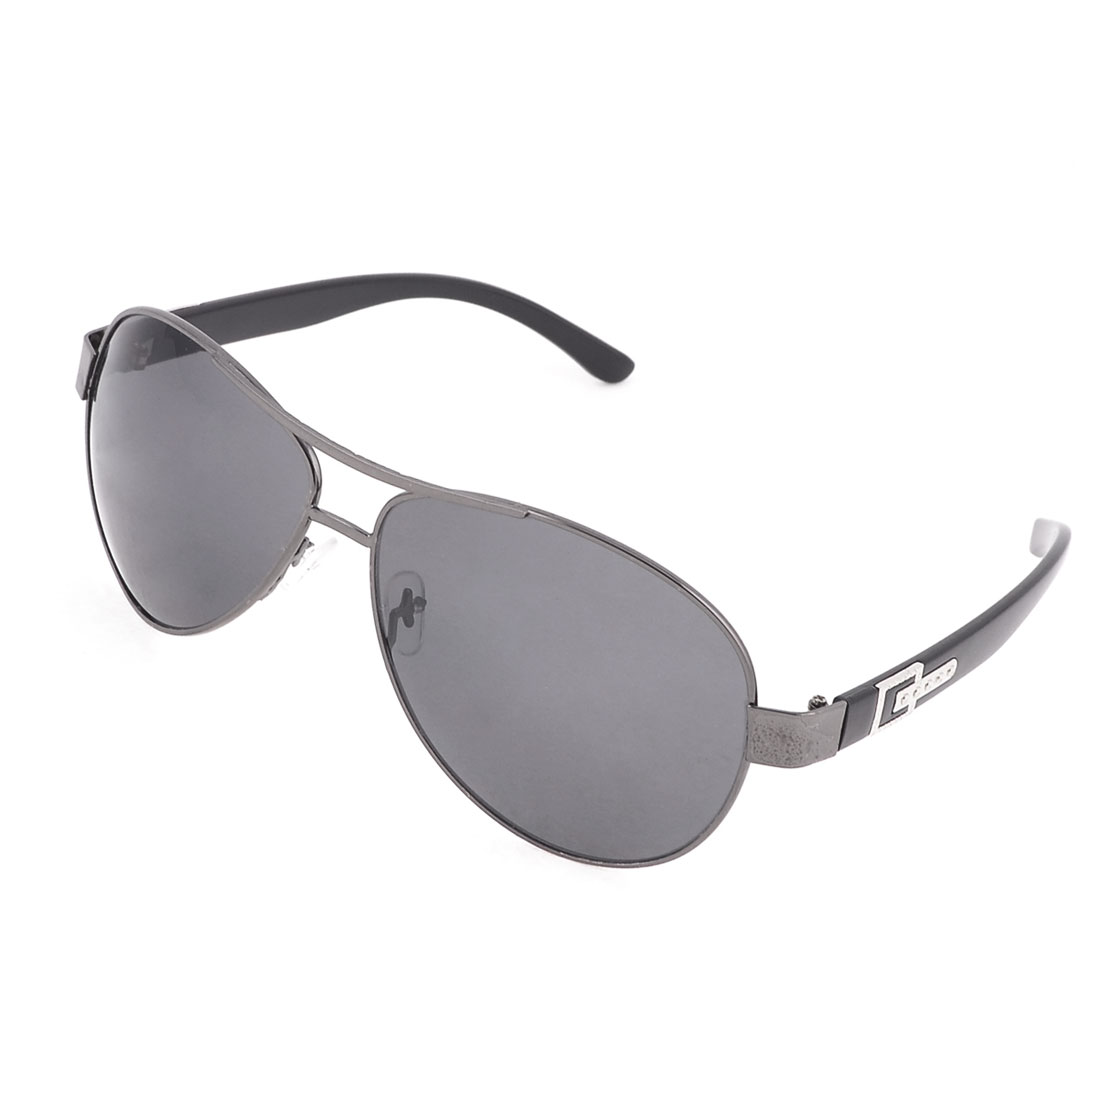 Men Travelling Metal Rim Teardrop Black Lens Protective Glasses Sunglasses